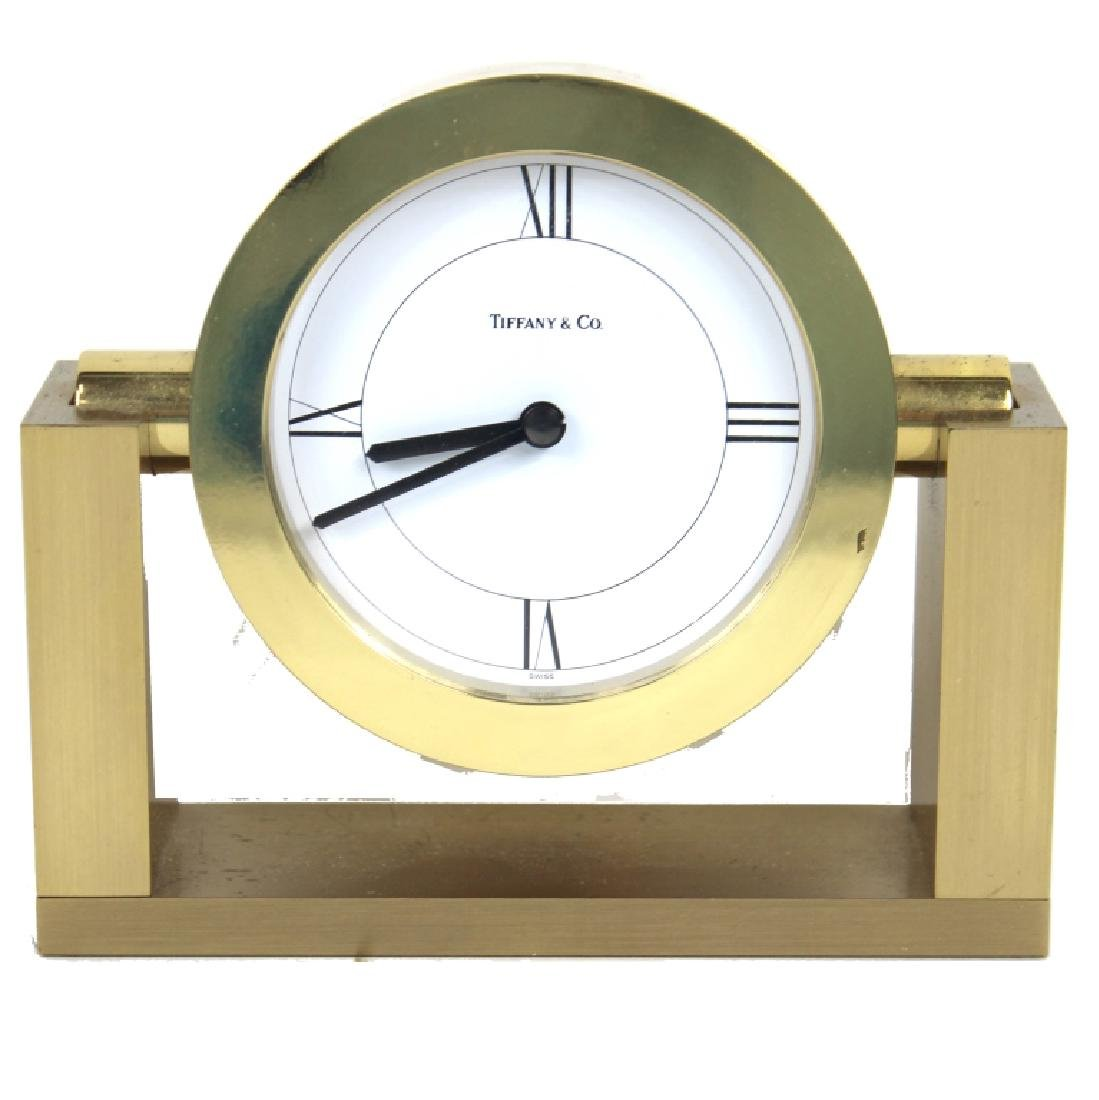 TIFFANY & CO. SWIVEL FRAME, BRASS DESK CLOCK